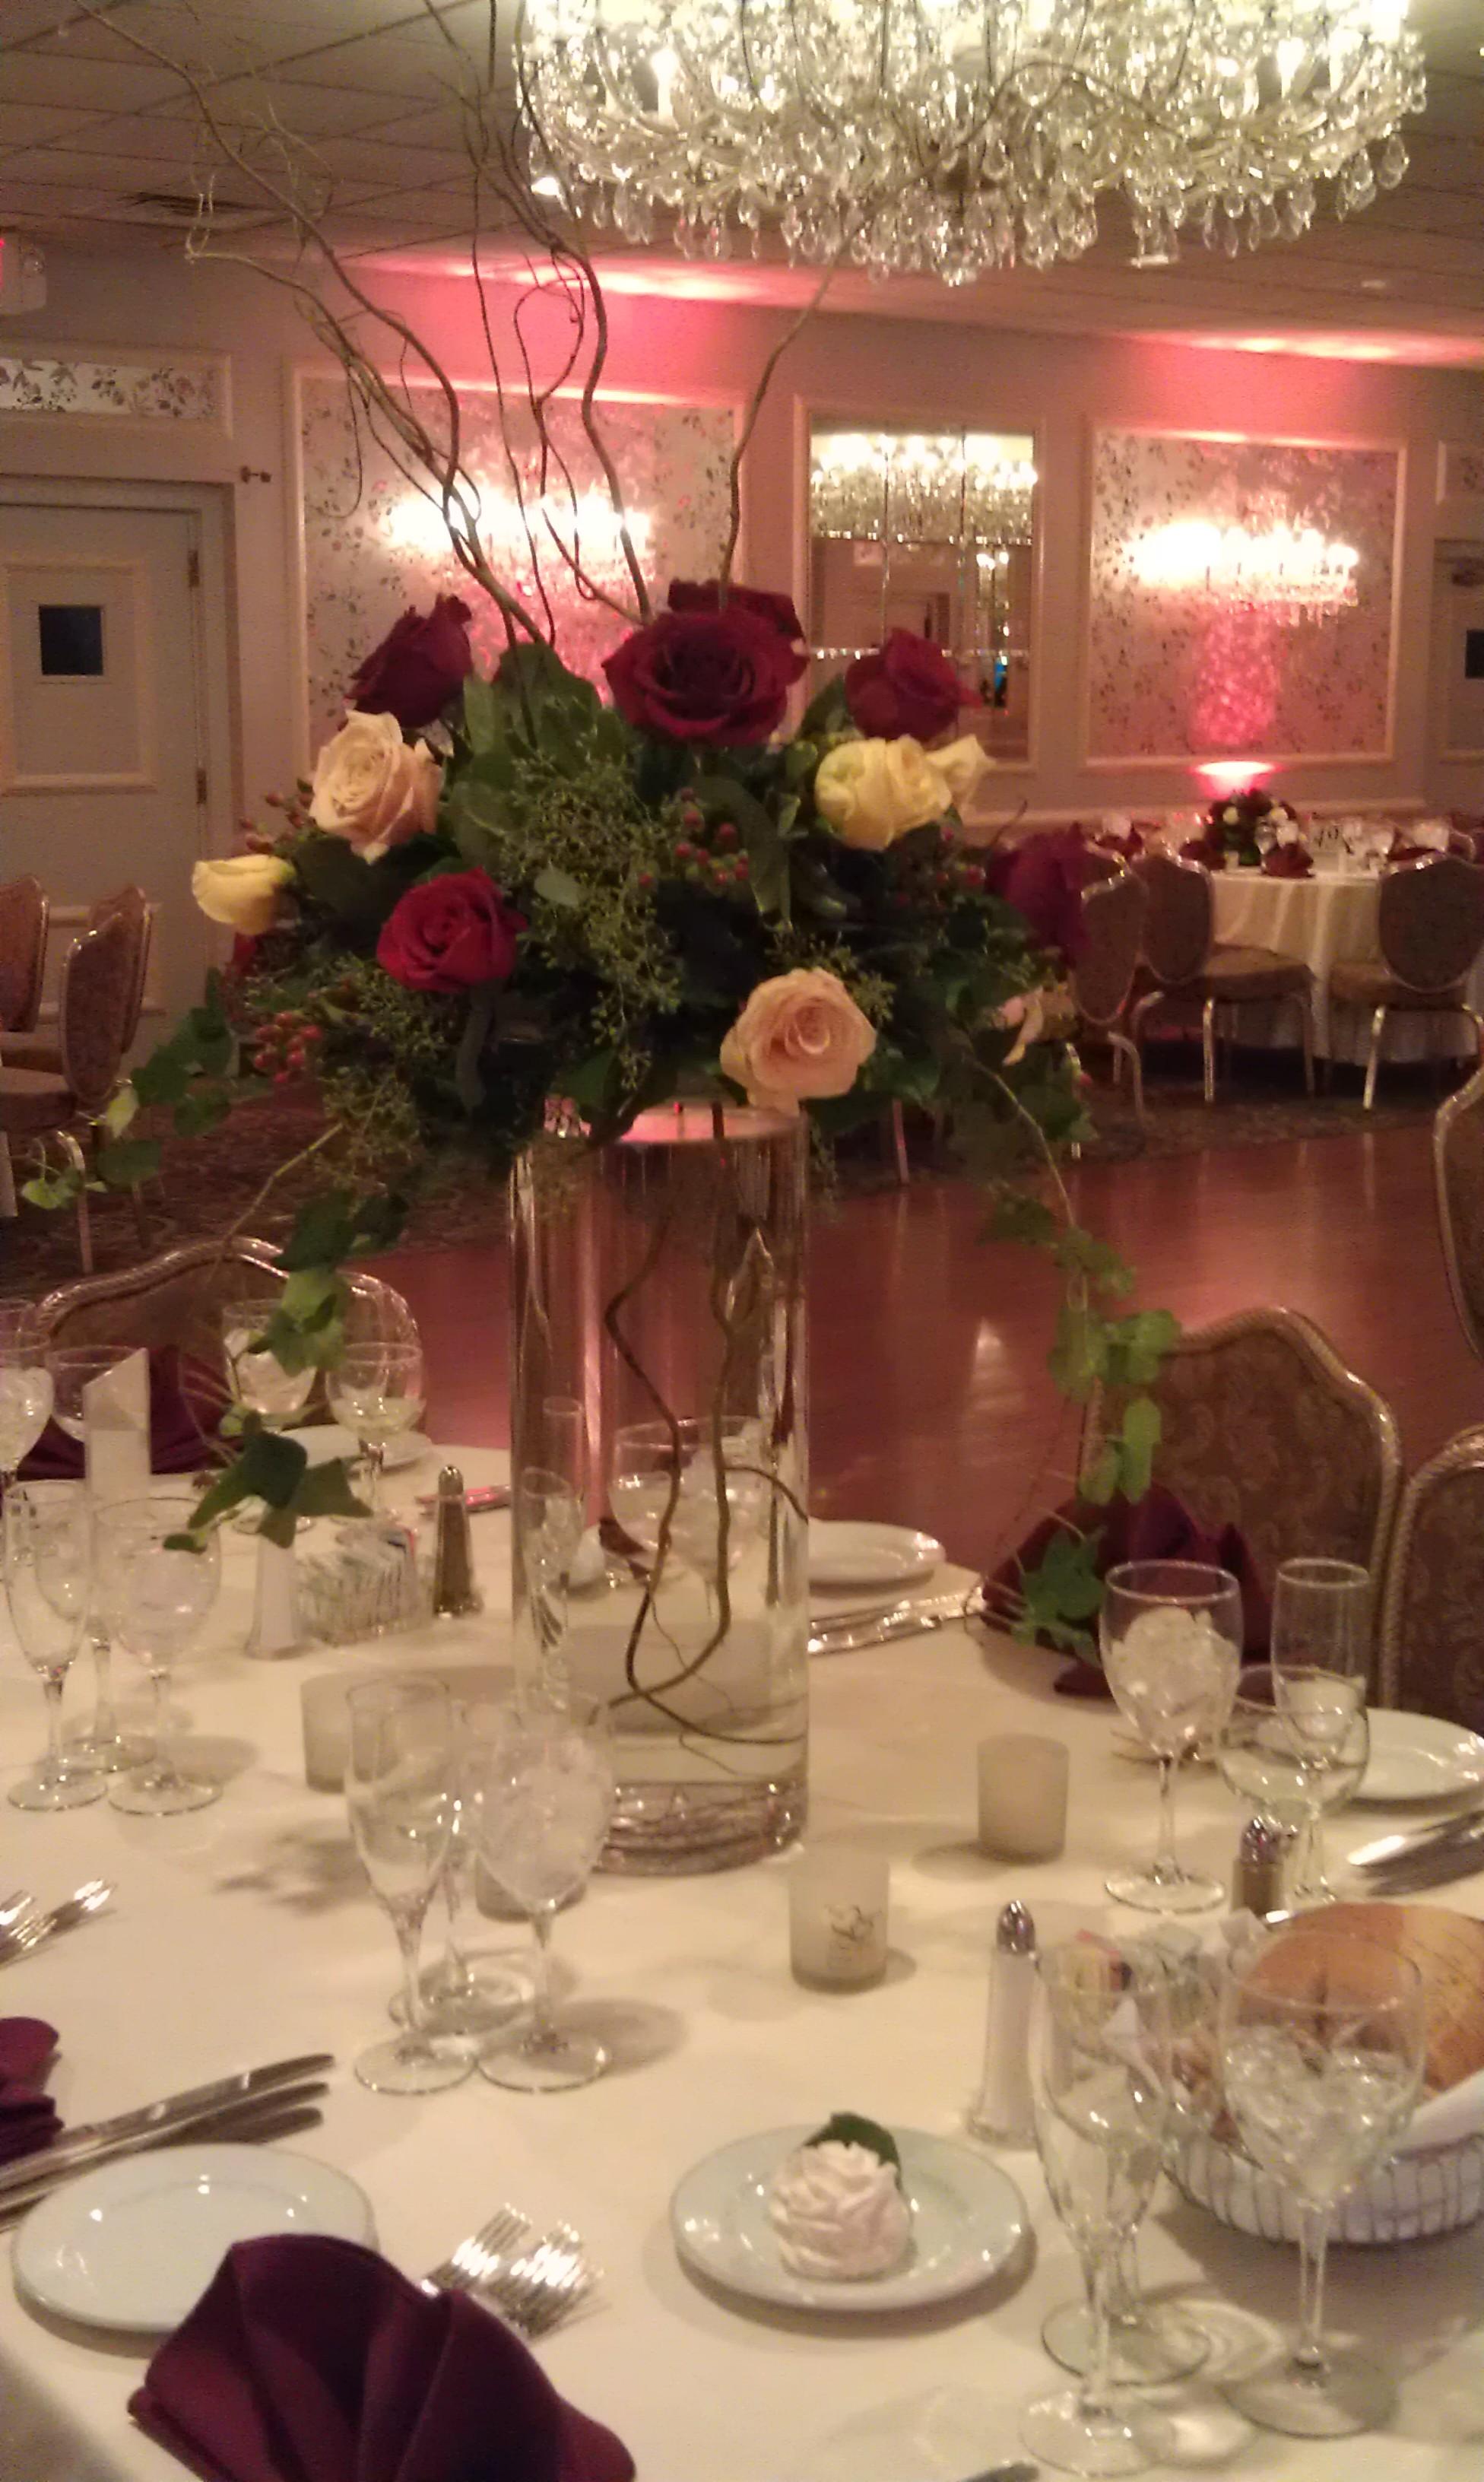 Sunnyside Gardens & Gifts Wedding Vendor in New Jersey | PartySpace